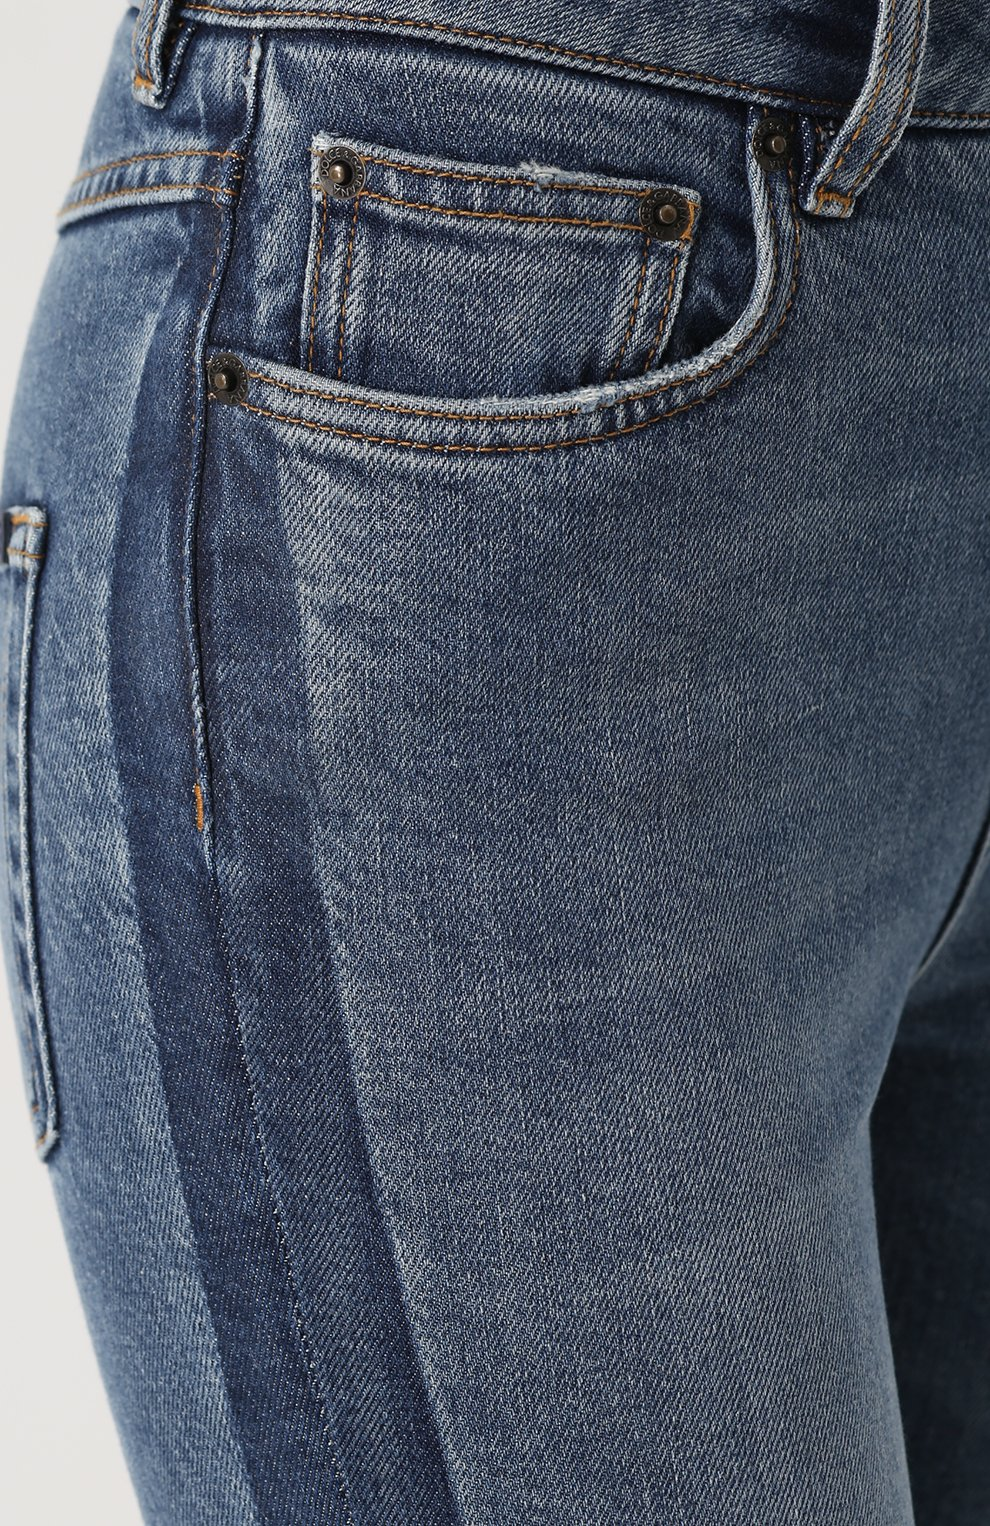 Джинсы-скинни с потертостями Dolce & Gabbana синие   Фото №5